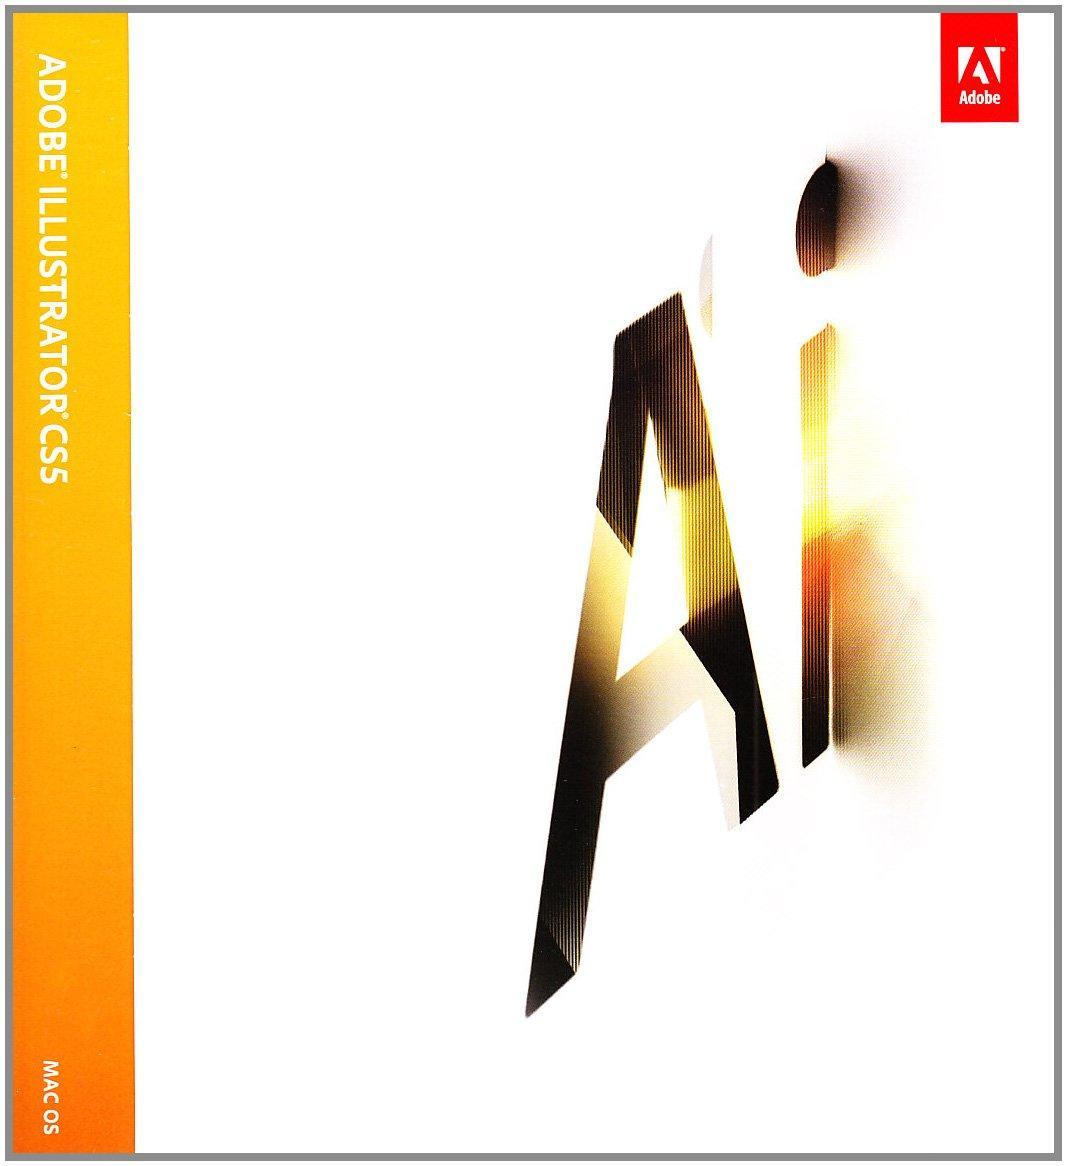 Adobe Illustrator CS5 15 per Mac